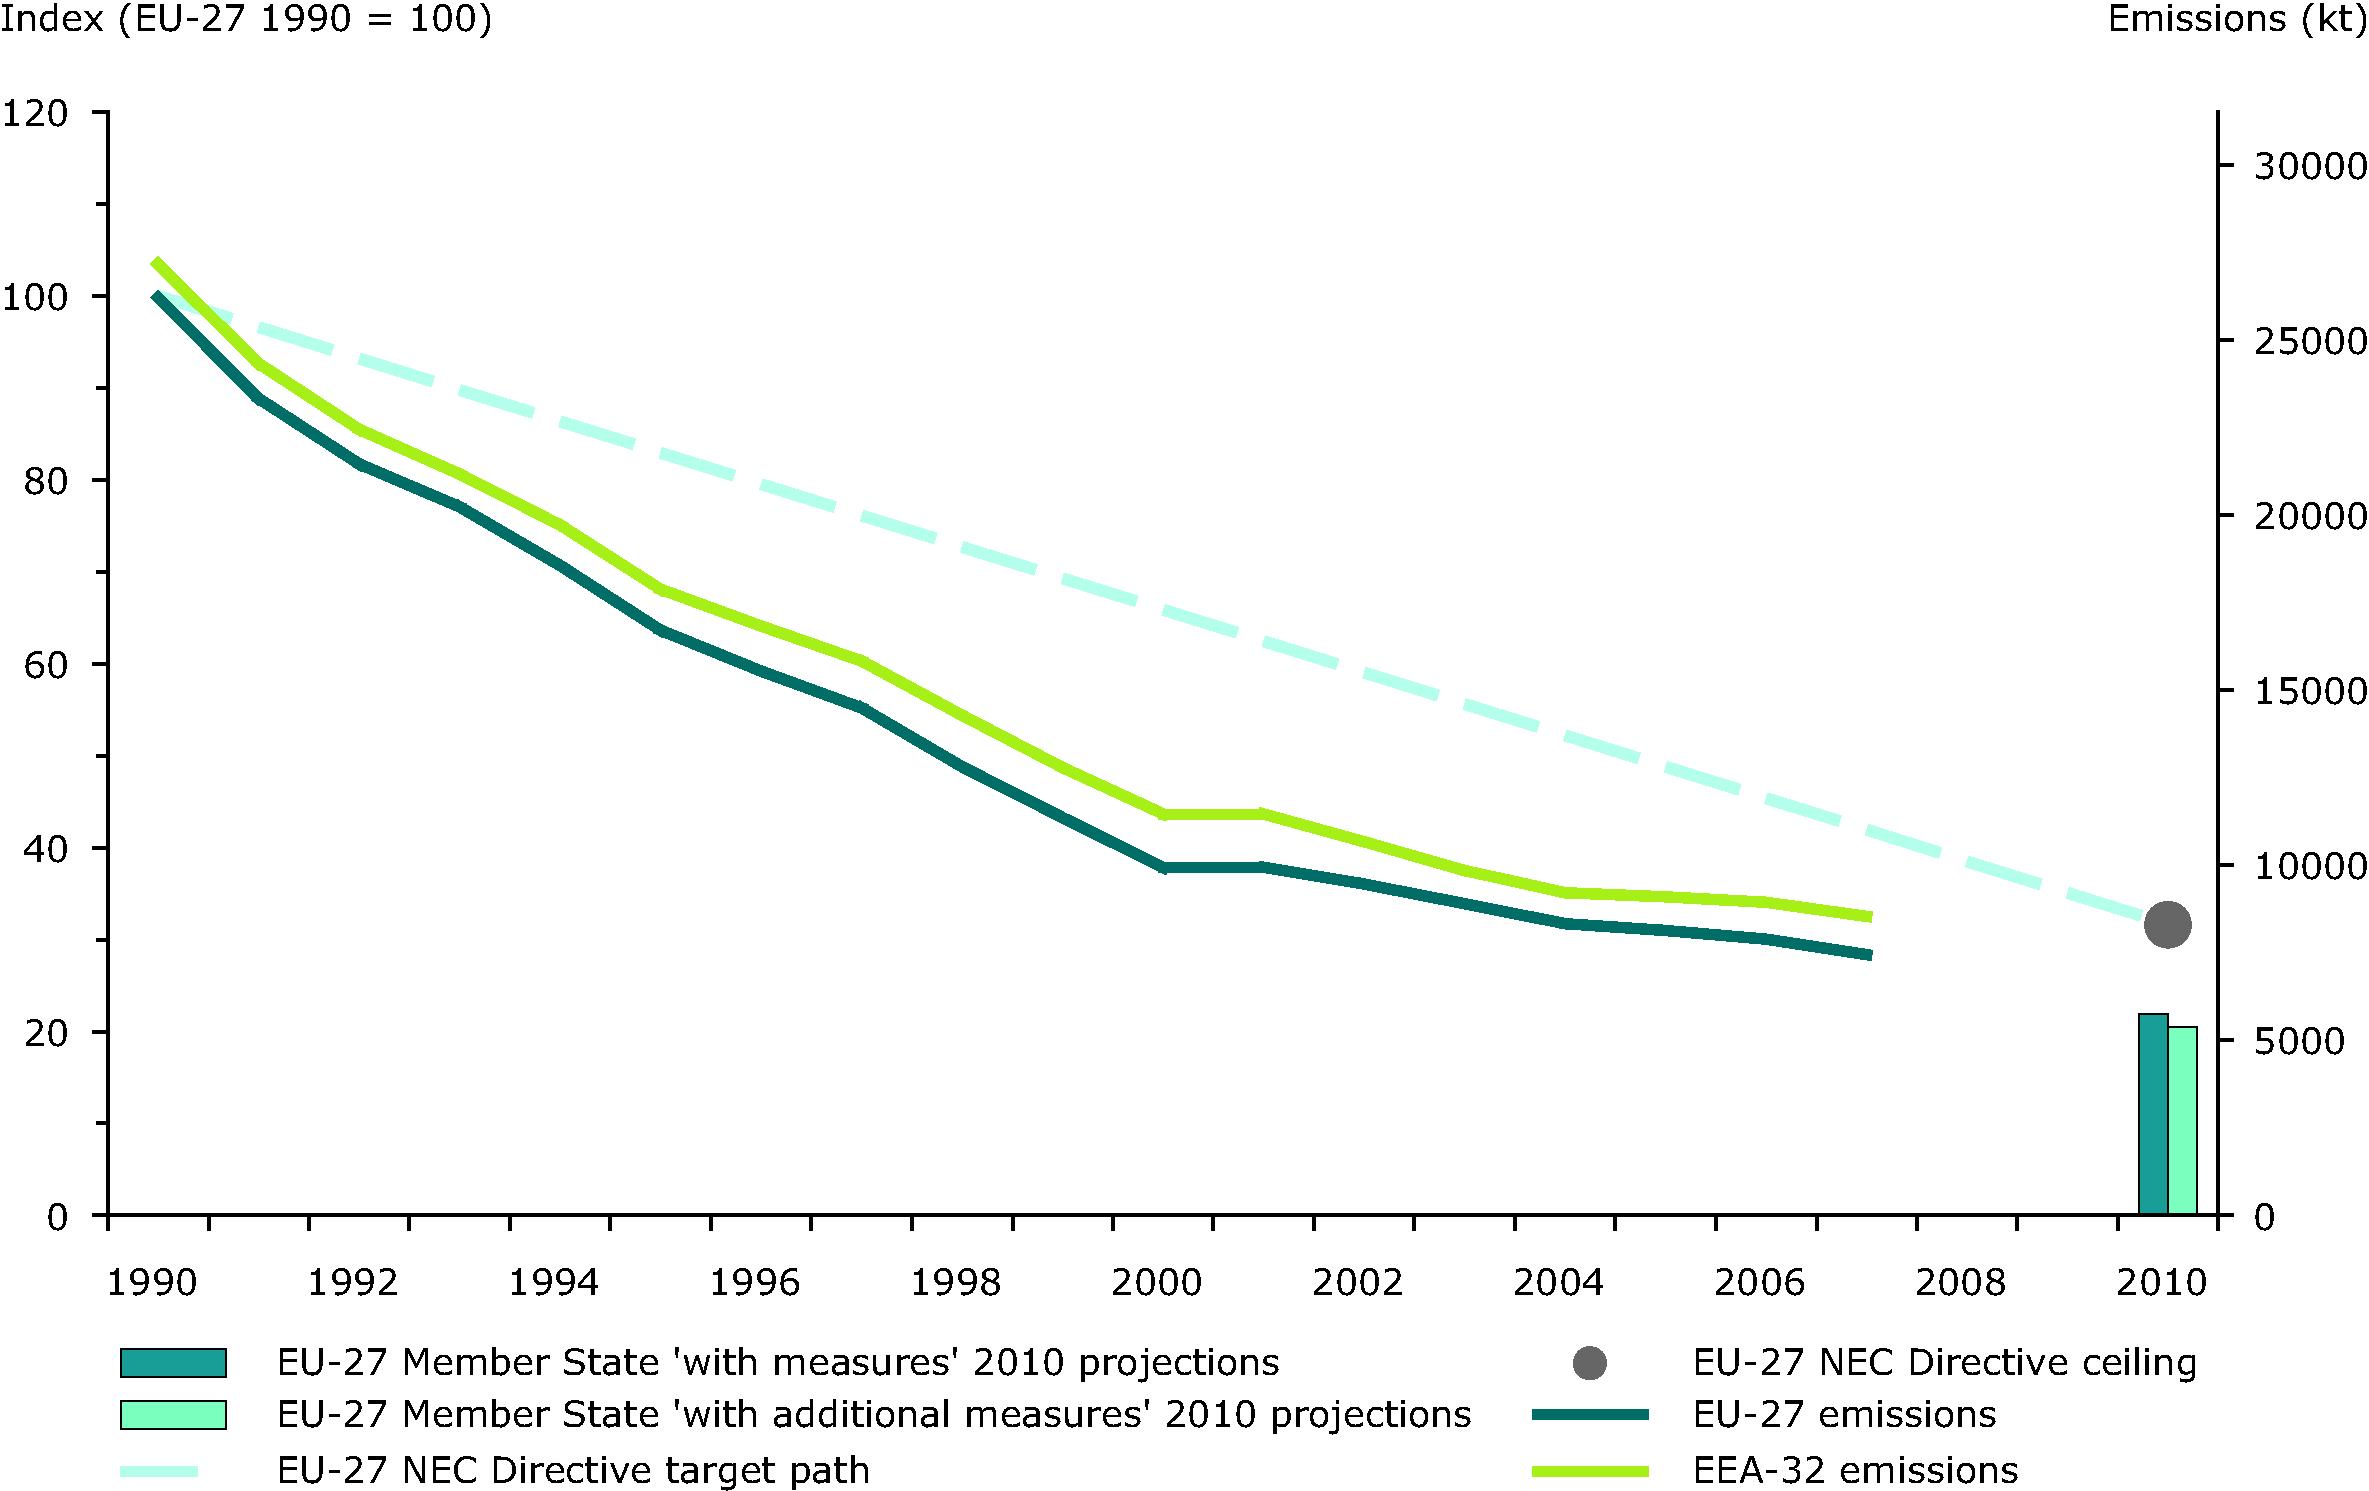 Emission trends of sulphur dioxide (EEA member countries, EU-27 Member States)